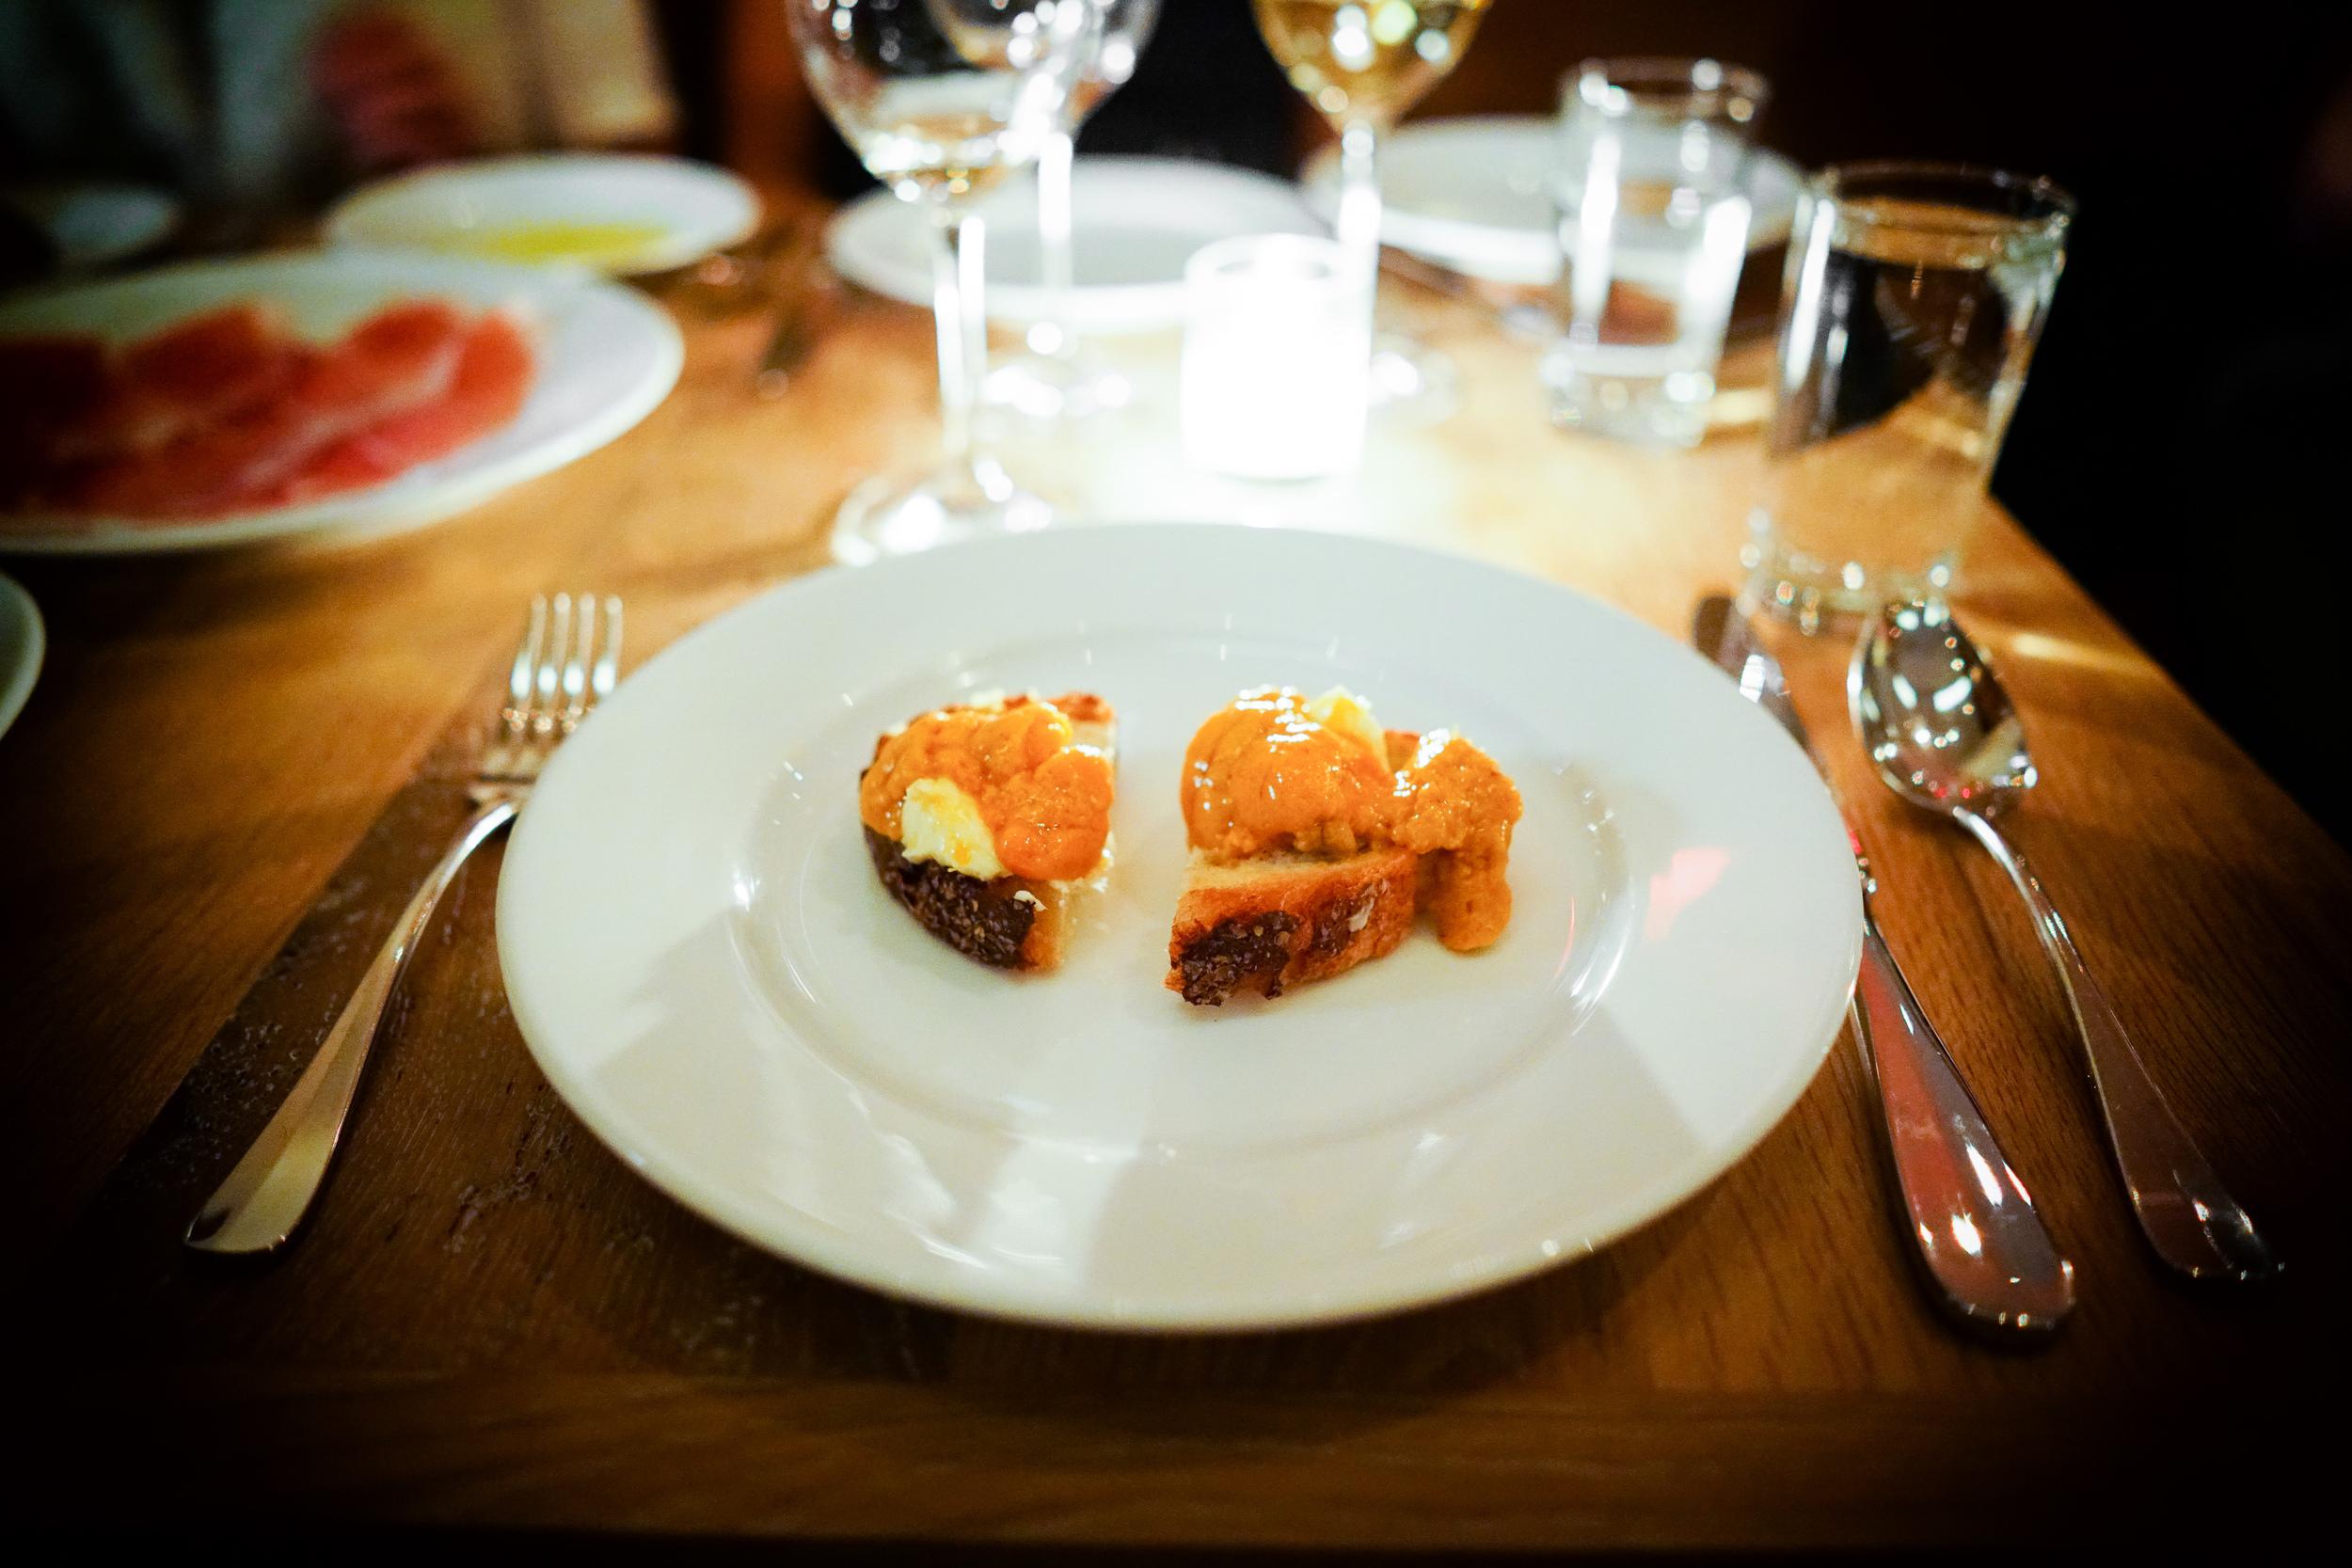 Sea urchin and butter crostini ($19)